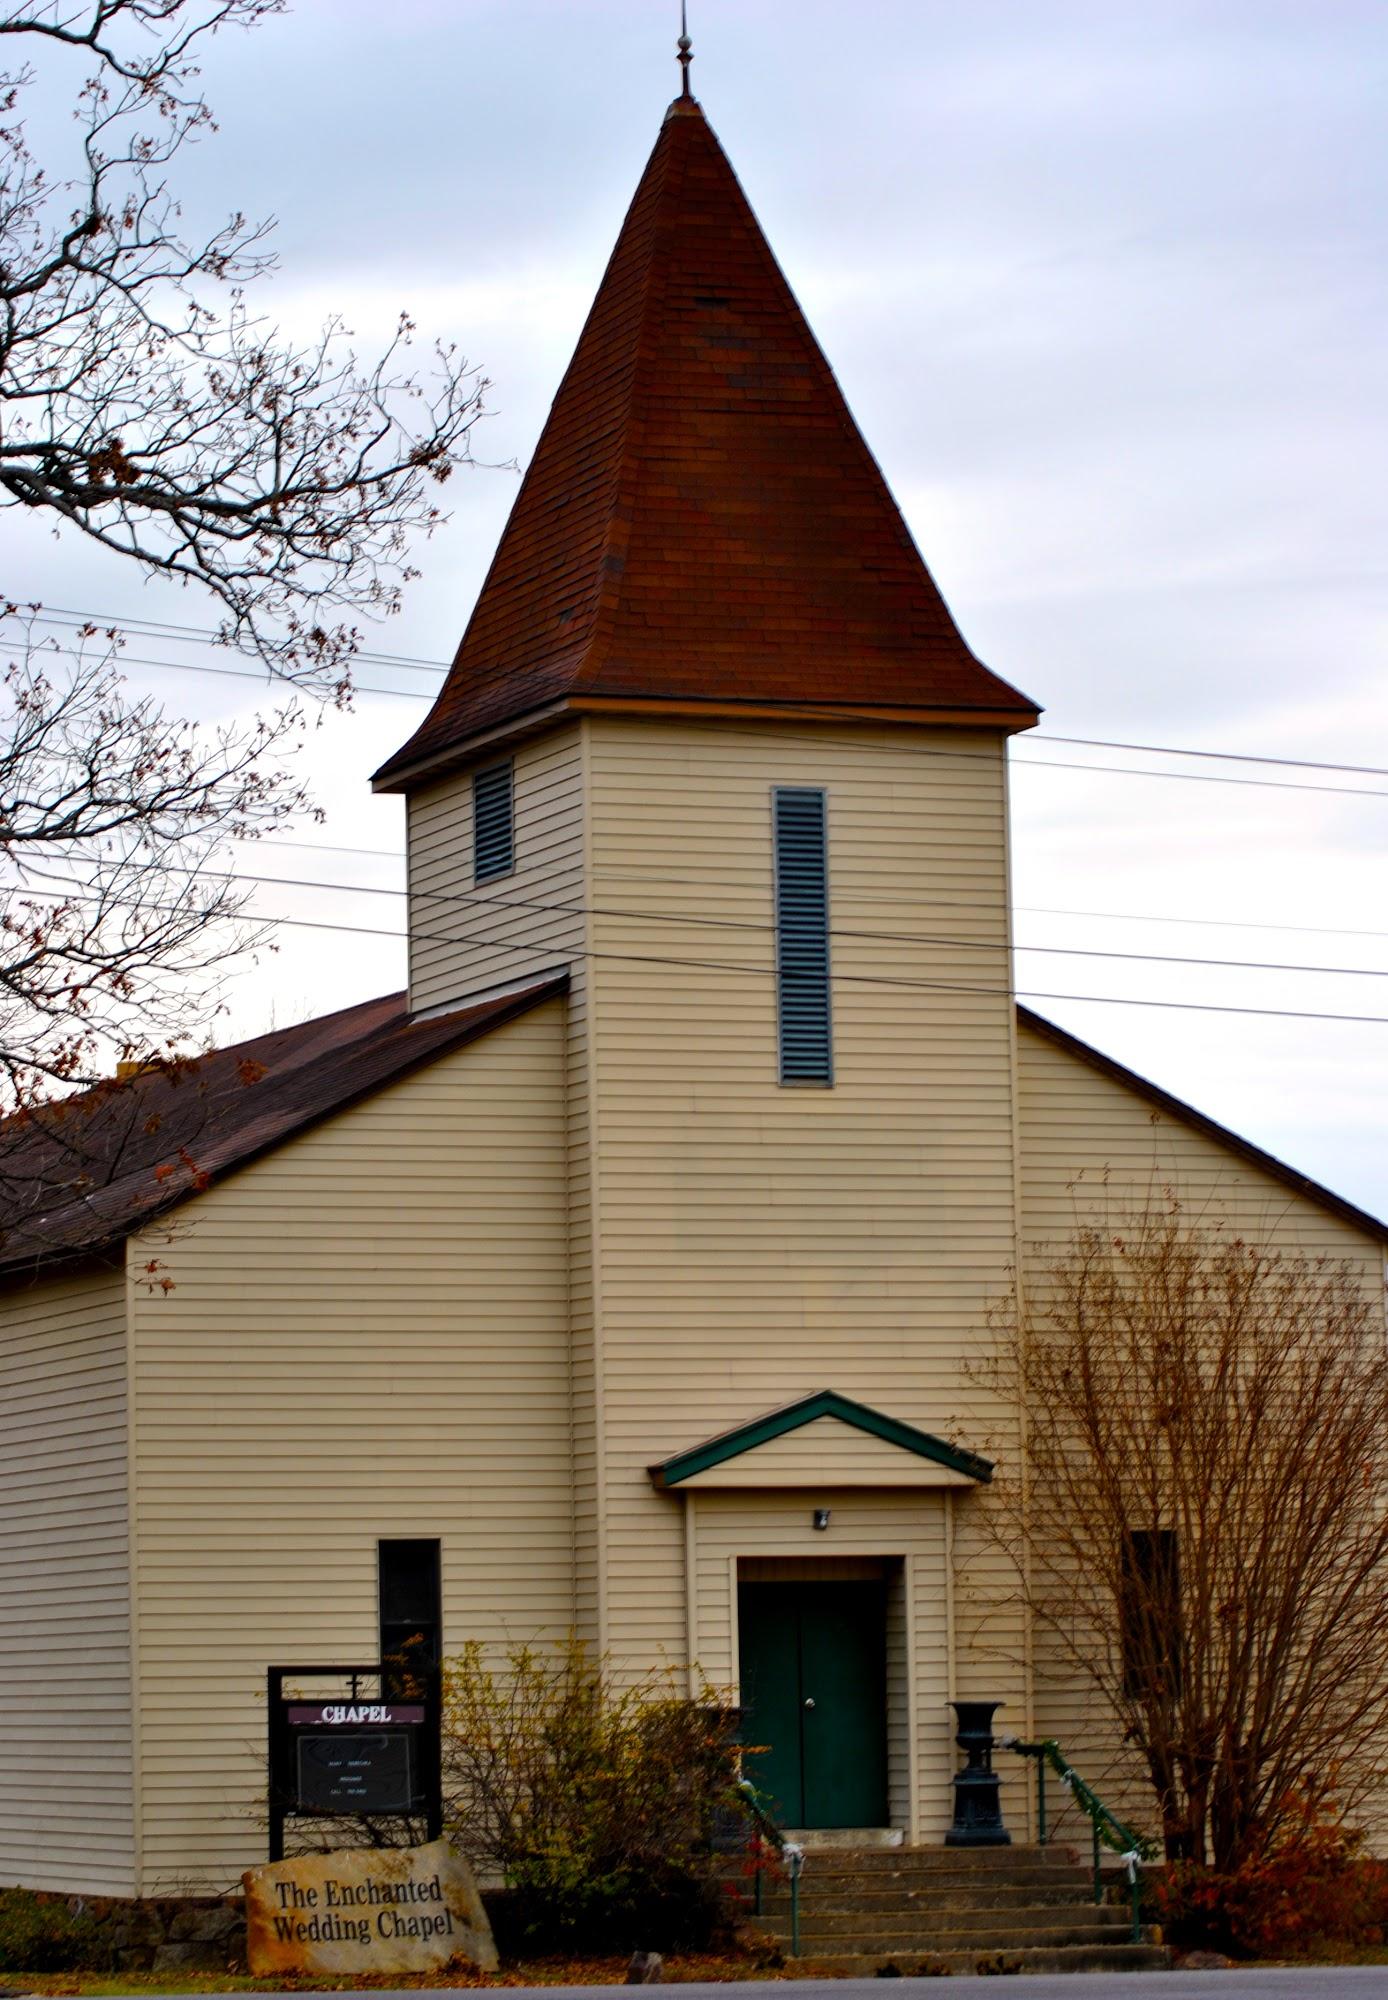 Enchanted Wedding Chapel 12001 Ward Ave, Fort Smith